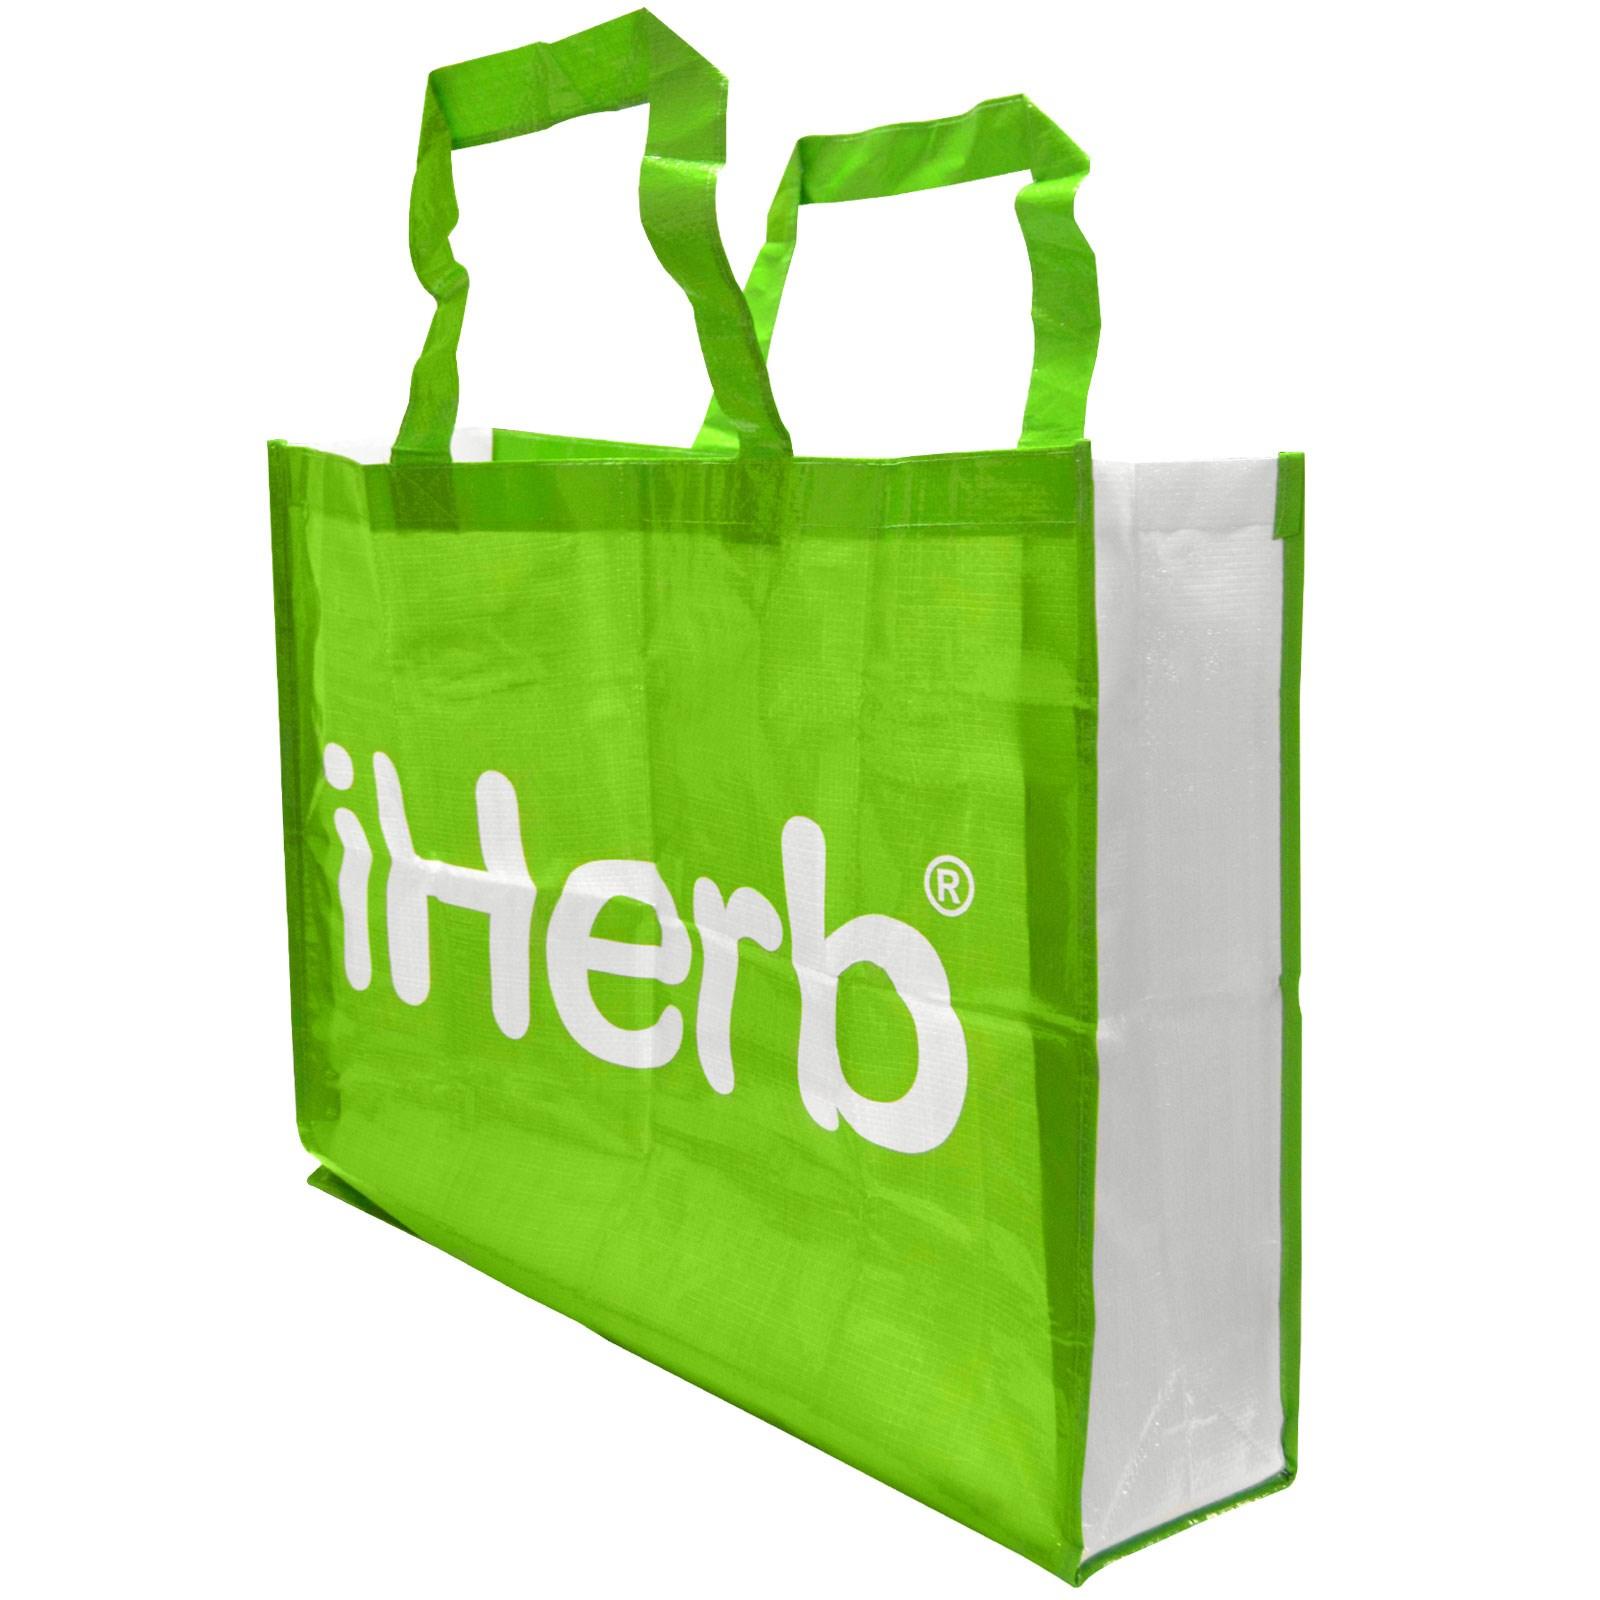 iHerb Goods!